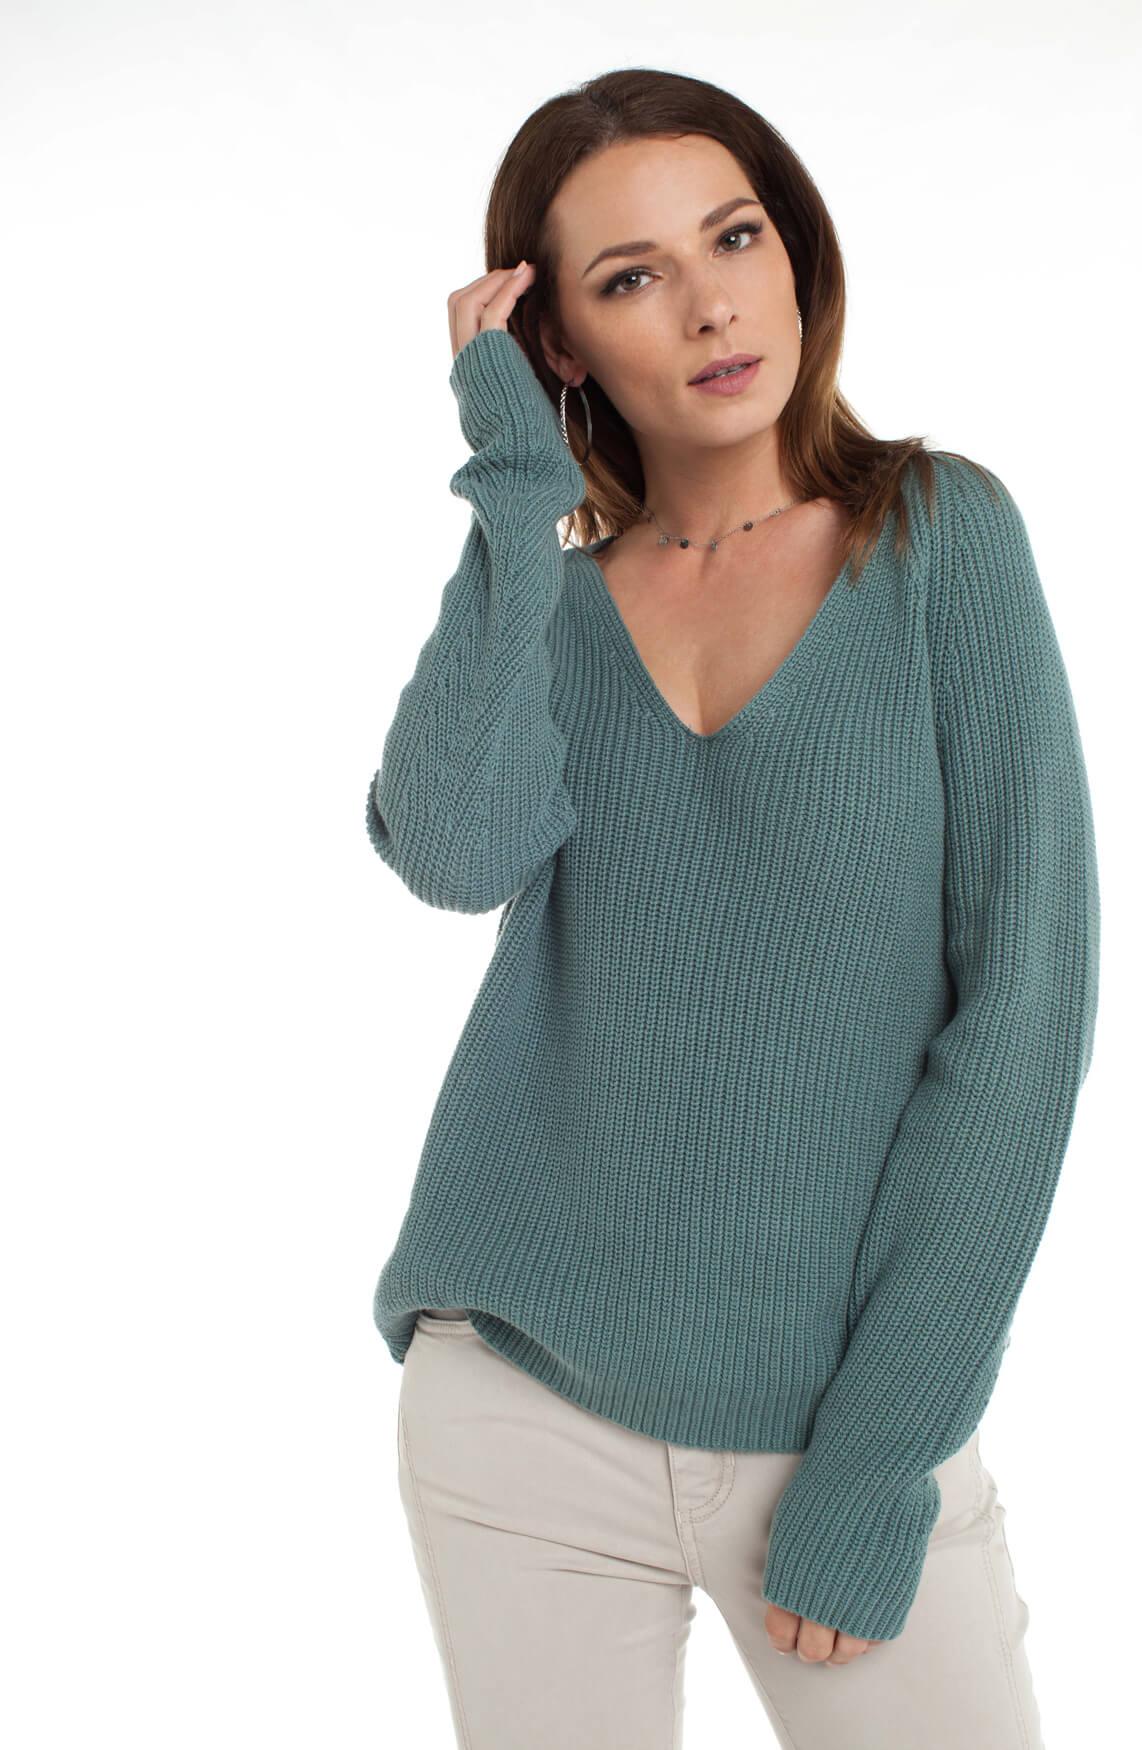 Anna Dames Grofgebreide trui met V-hals groen